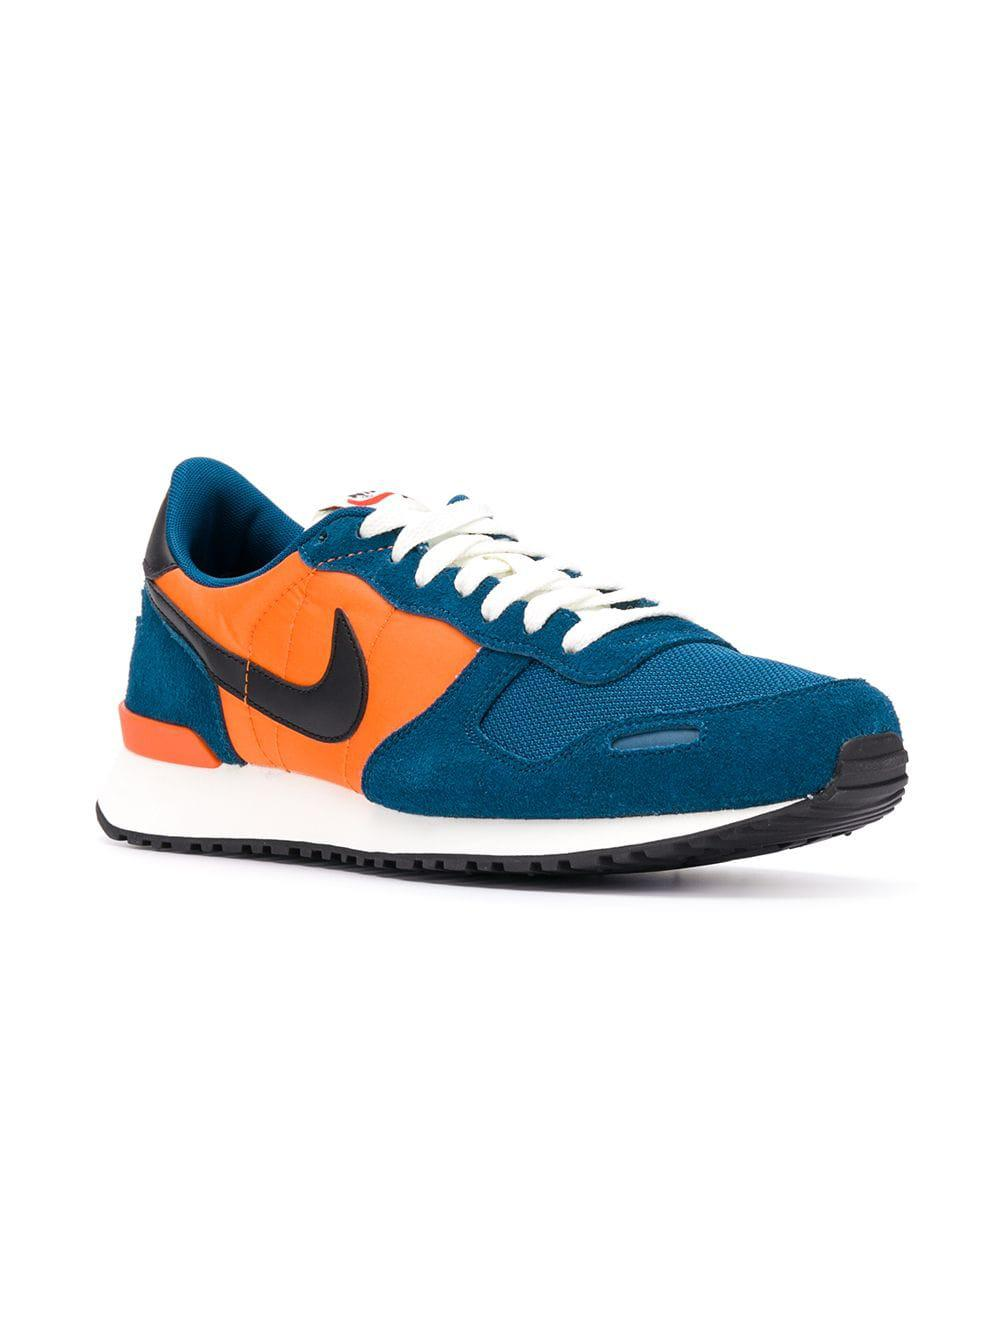 online retailer d5039 1ccc1 Lyst - Nike Air Vortex Sneakers in Blue for Men